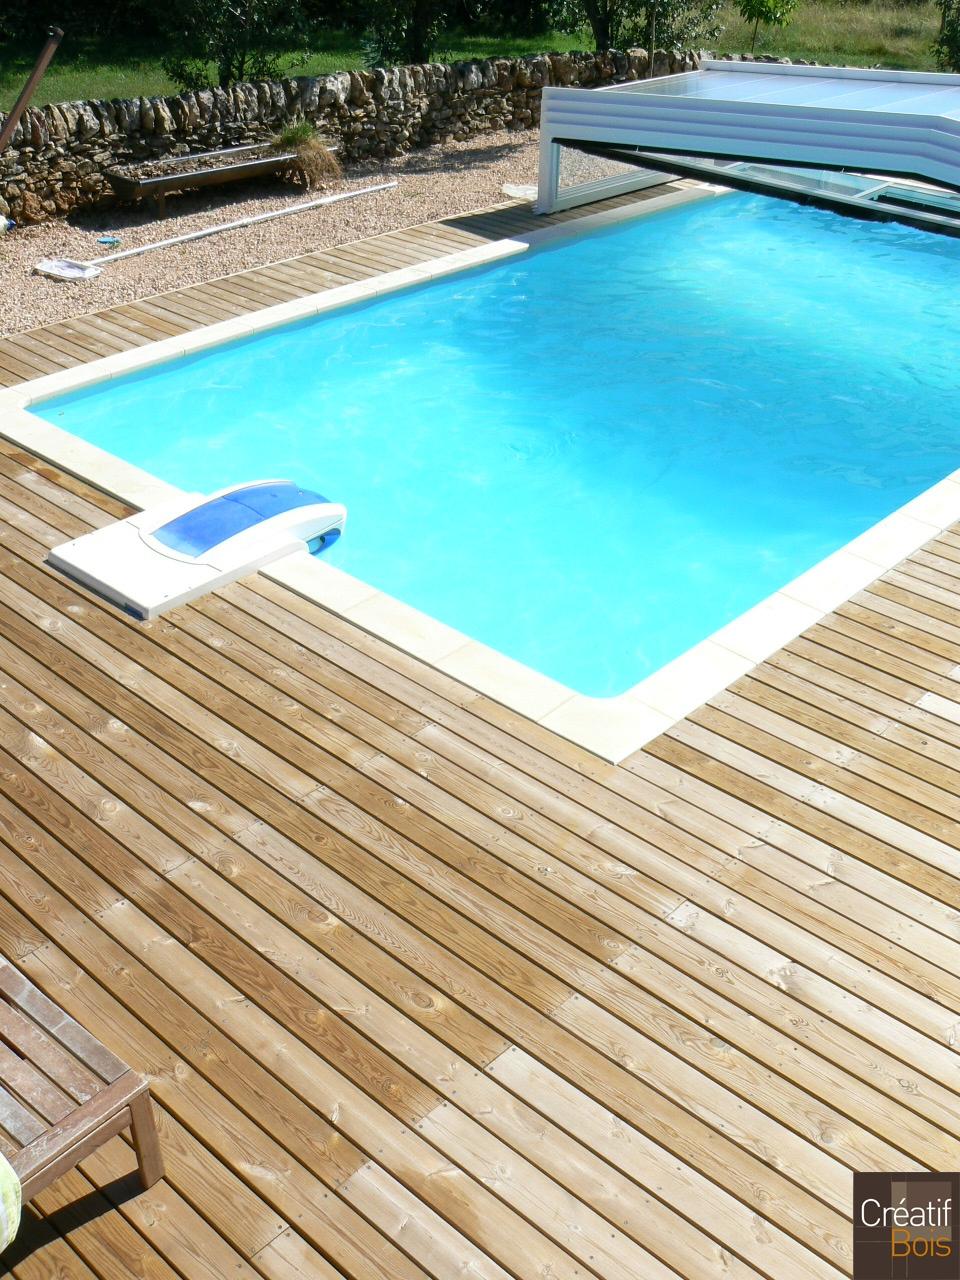 plage de piscine reyrevignes lot 46 plages de piscine galerie cr atif bois r alisation de. Black Bedroom Furniture Sets. Home Design Ideas